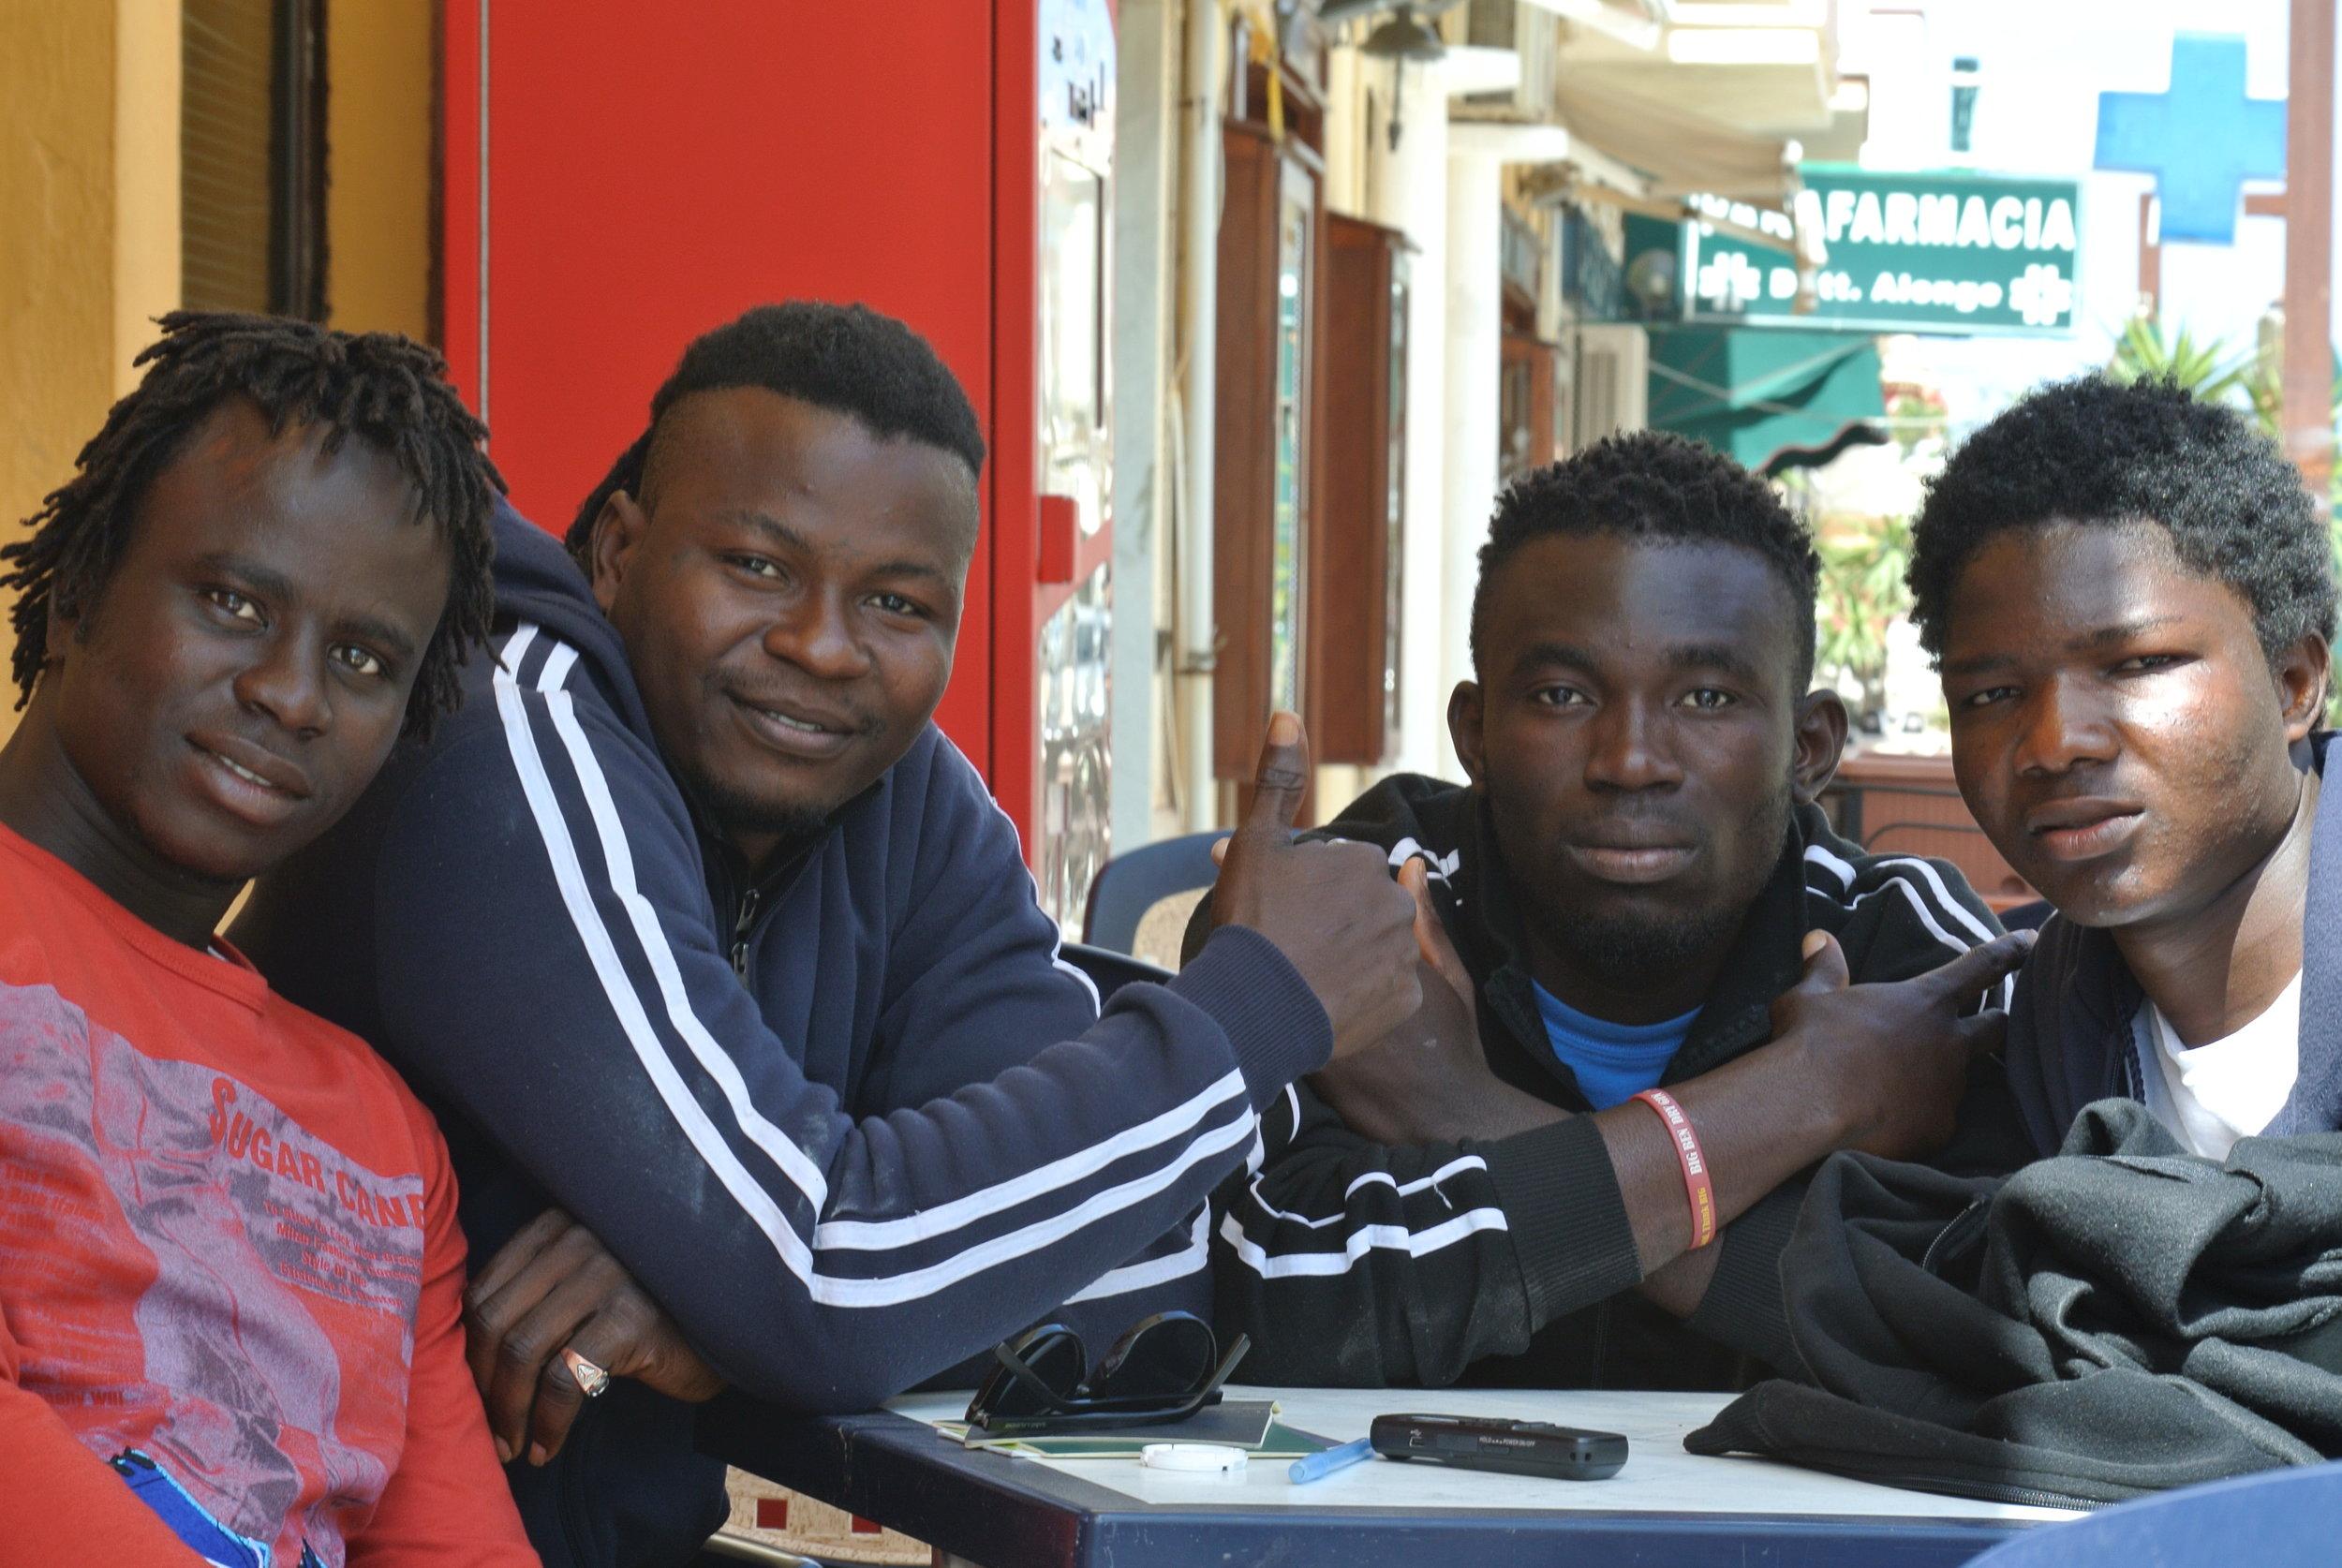 Yeussupha (17, Gambia),    Prince    (25, Nigeria),    Destiny    (22, Nigeria), and    Souleman    (19, Gambia), in Lampedusa, 29 April 2017. ©Pamela Kerpius